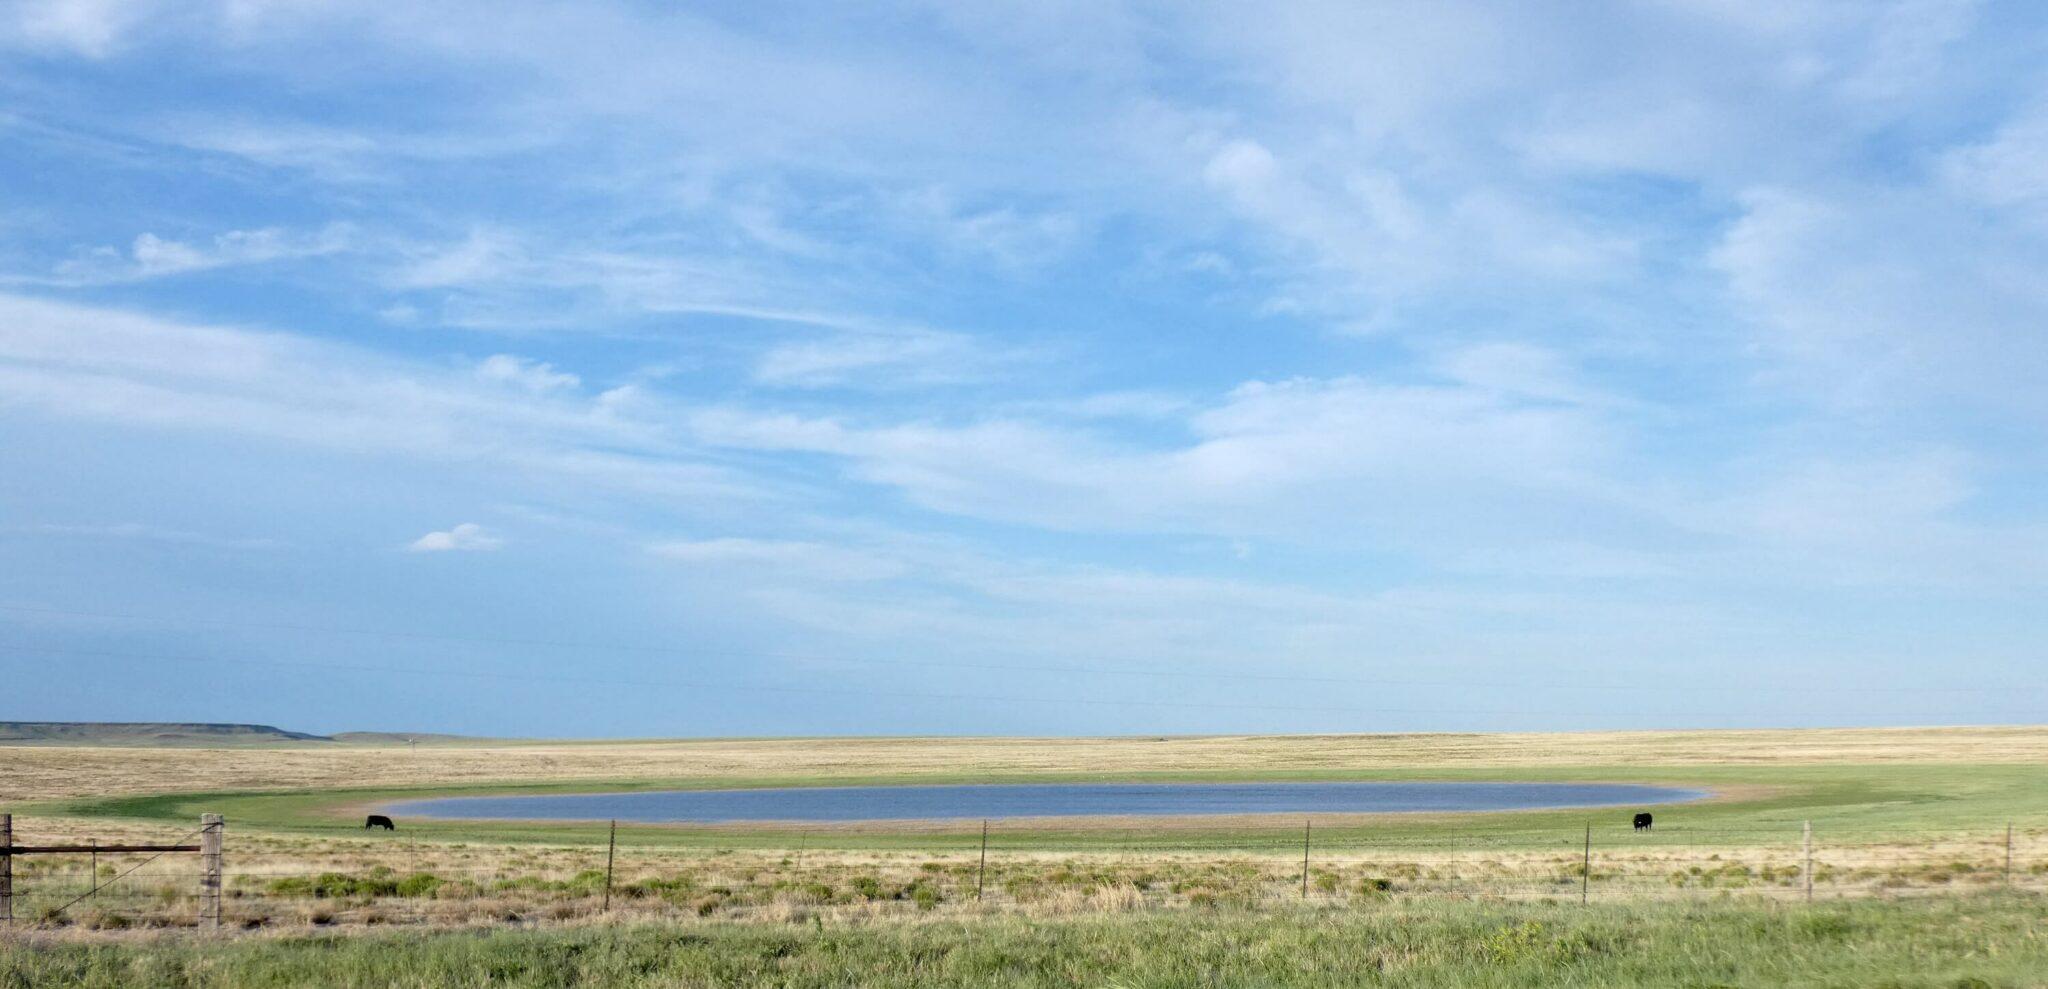 NM playa in grassland credit - Christopher Rustay